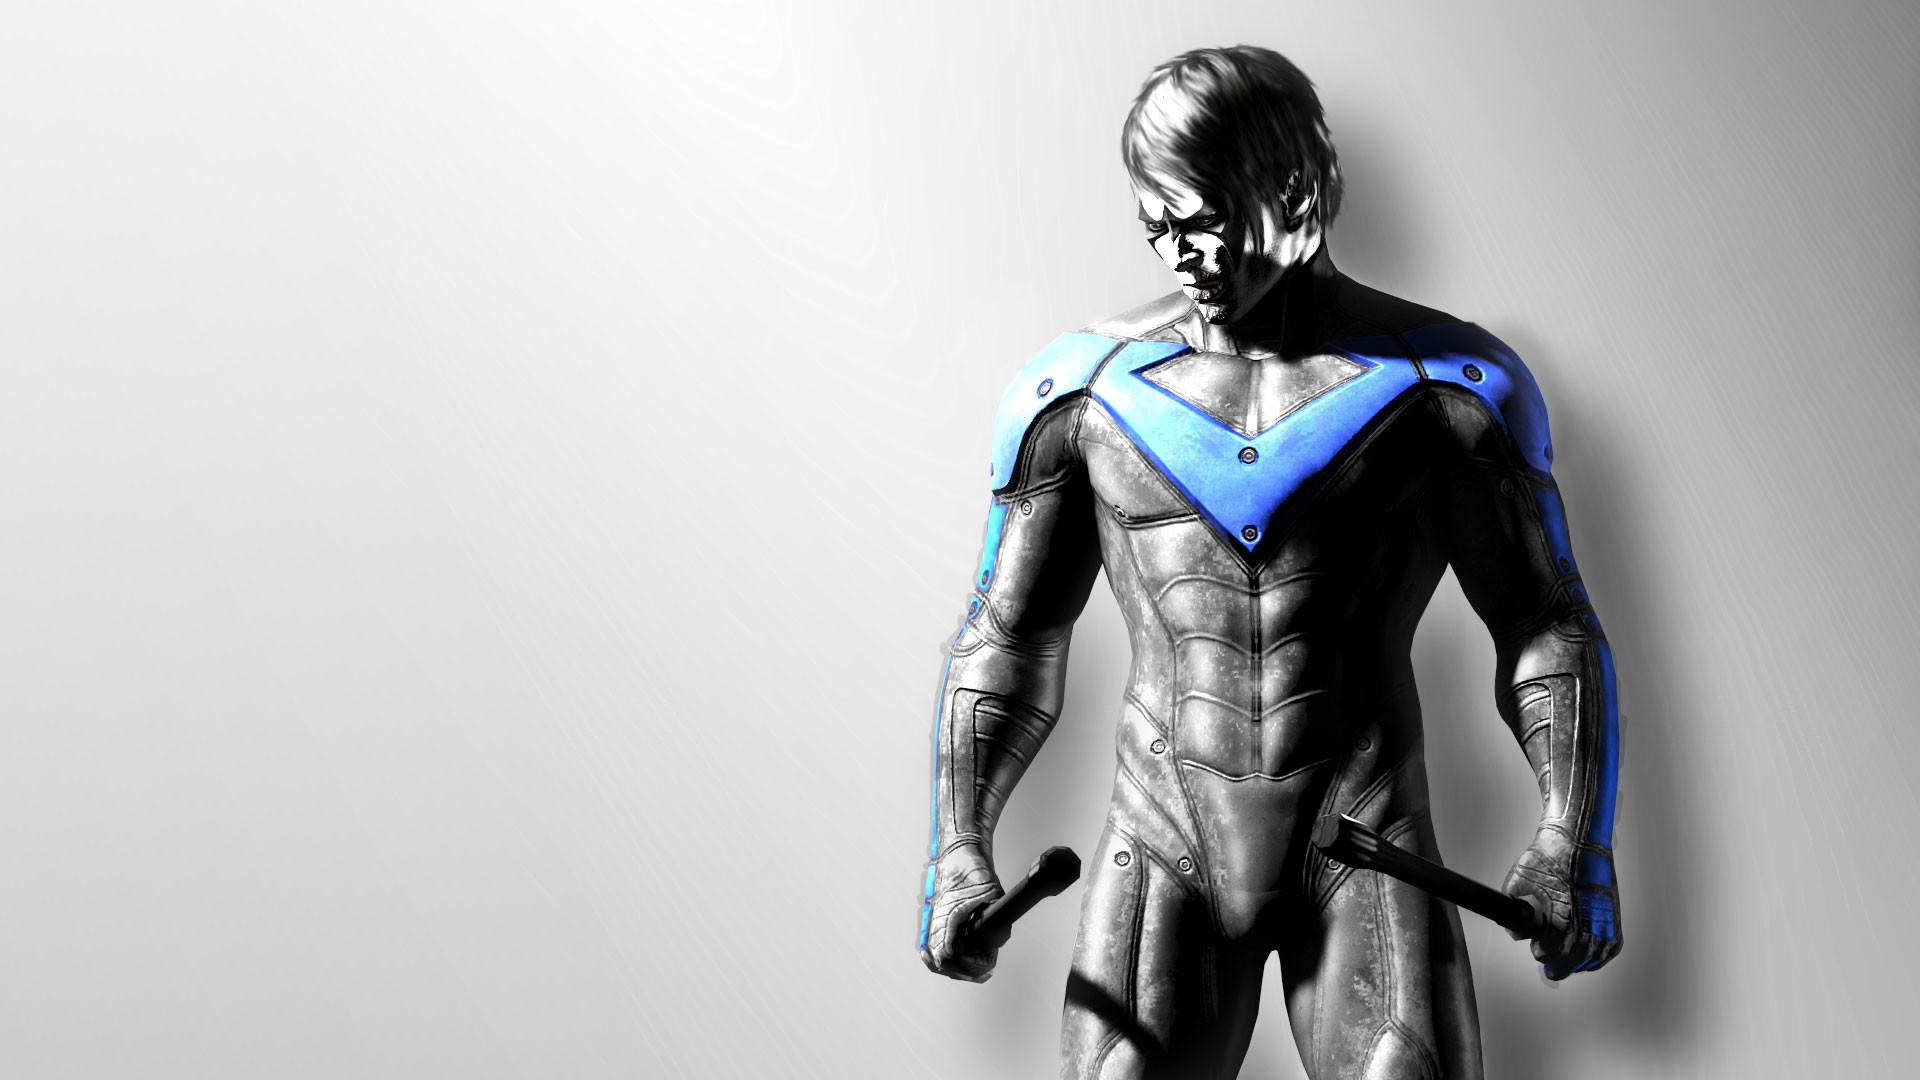 Batman Arkham City – Nightwing wallpaper